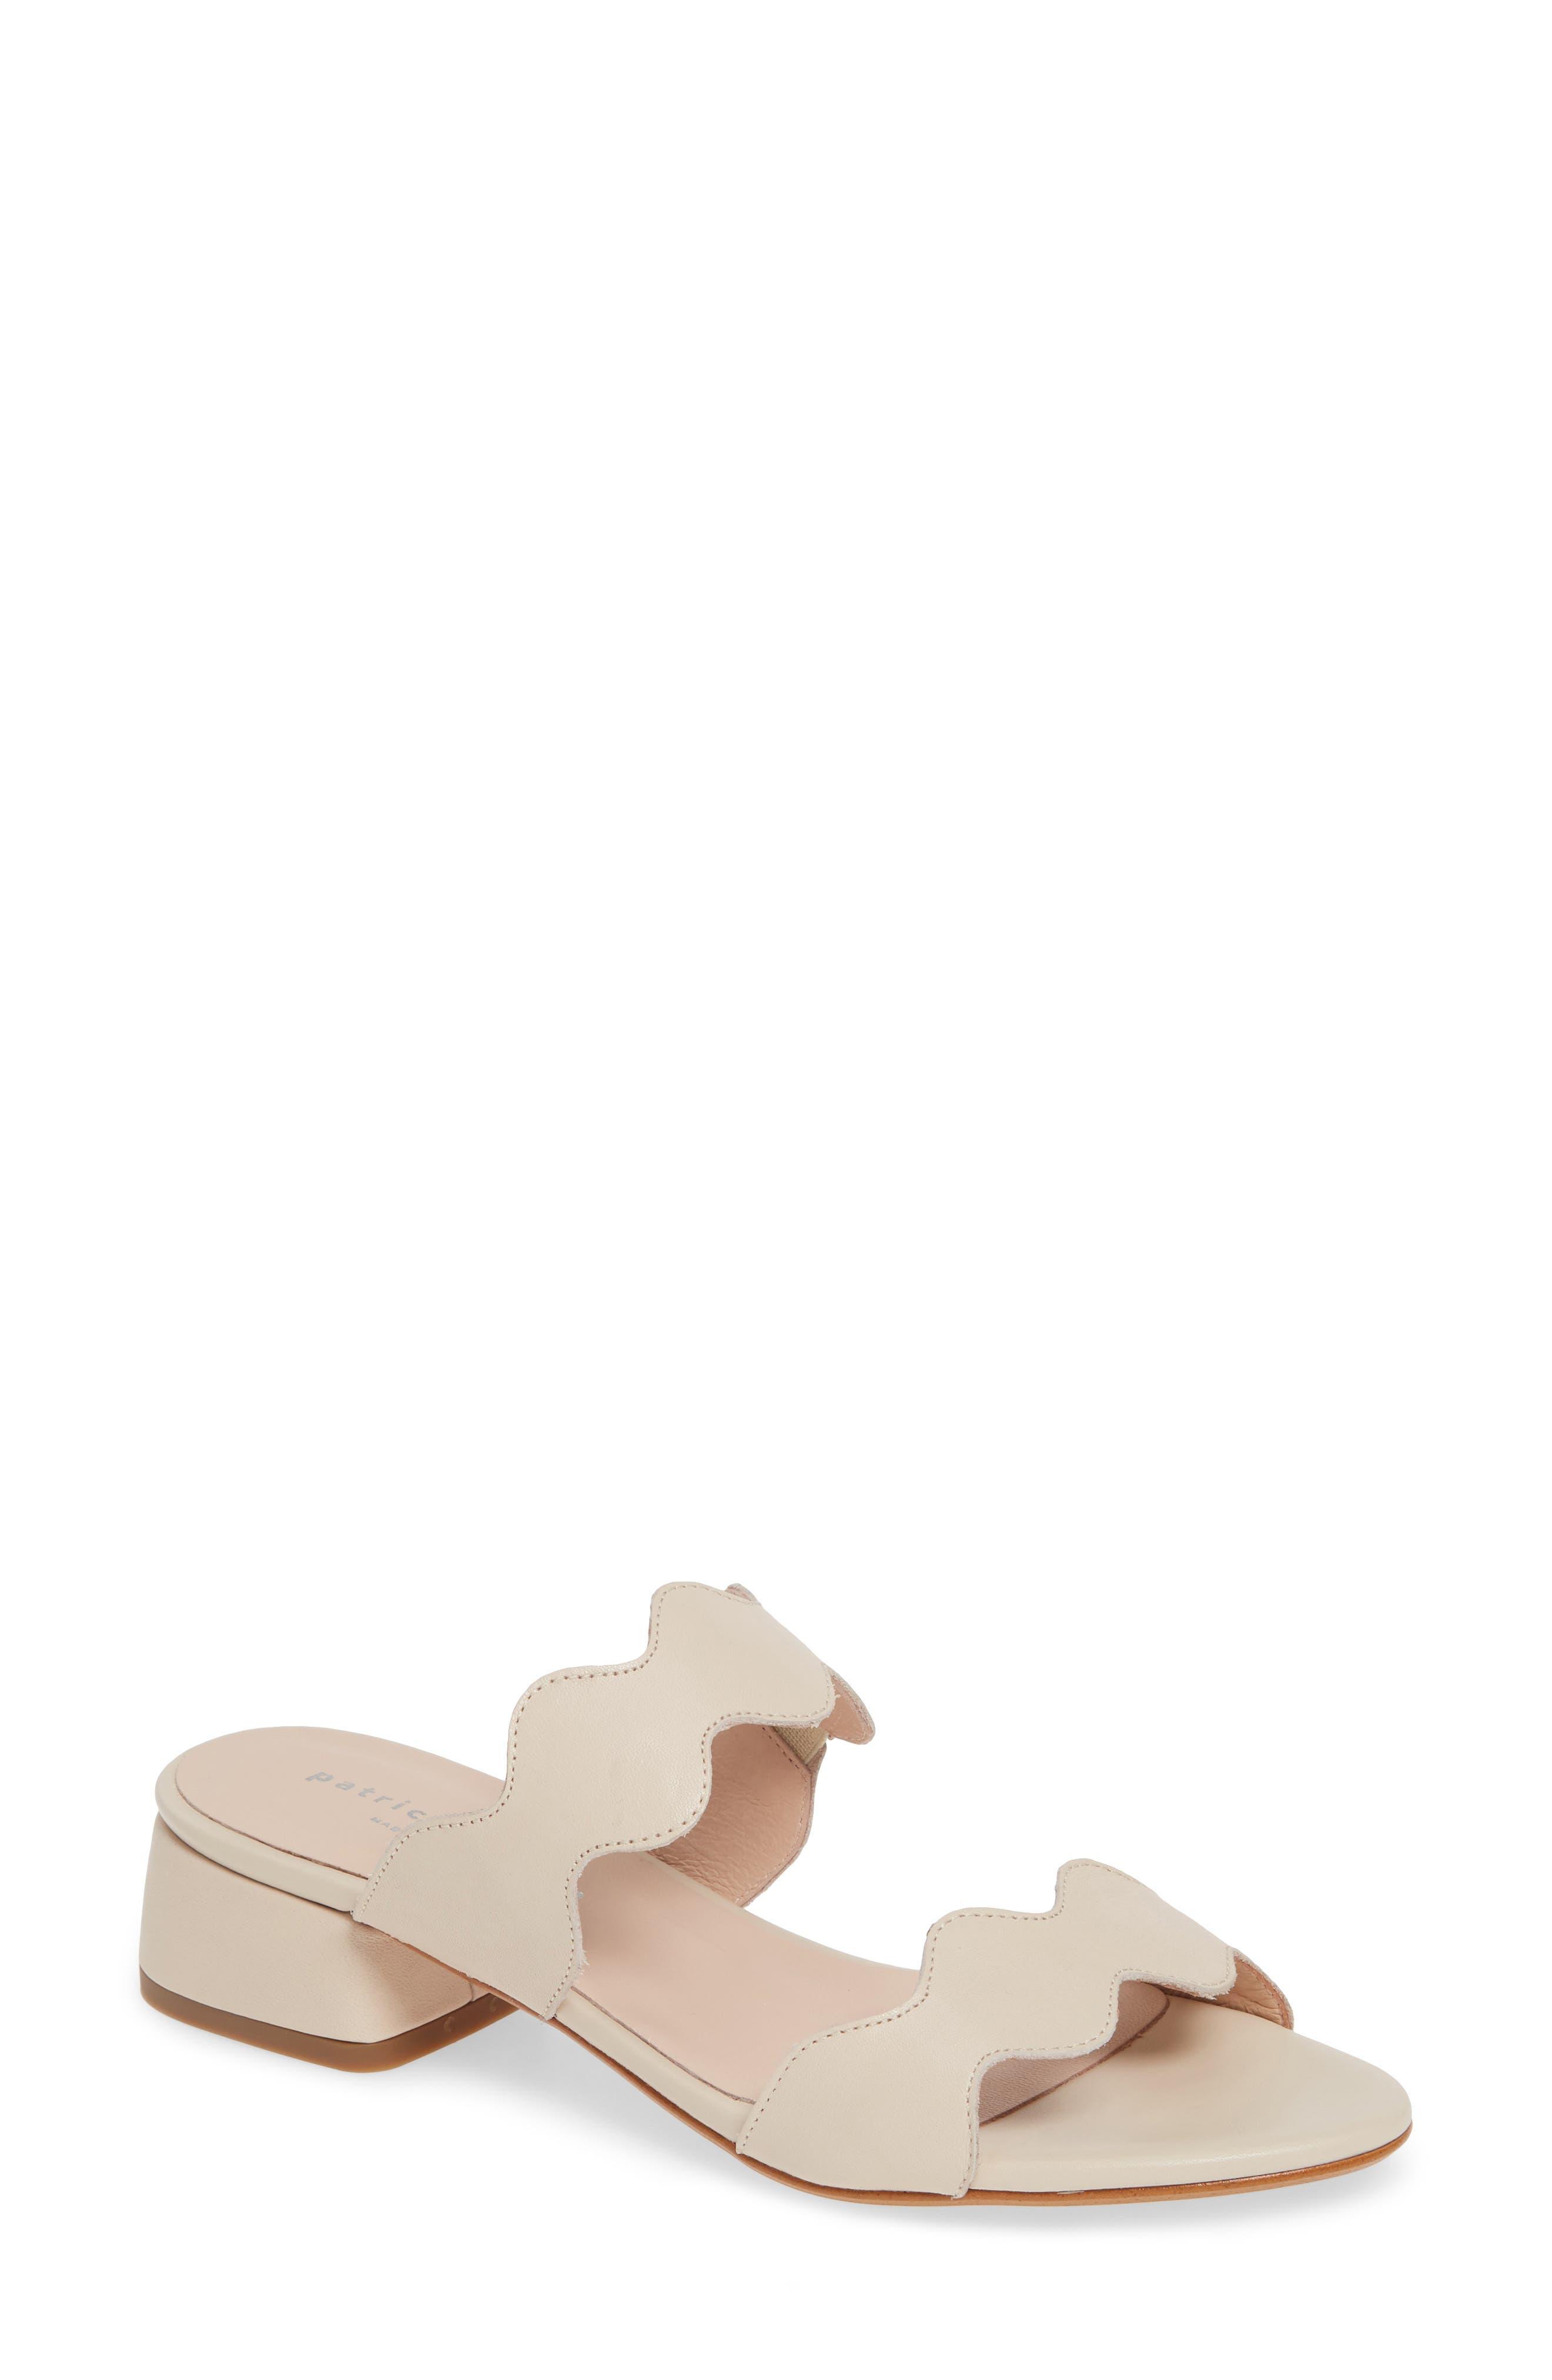 Patricia Green Bali Slide Sandal- Beige